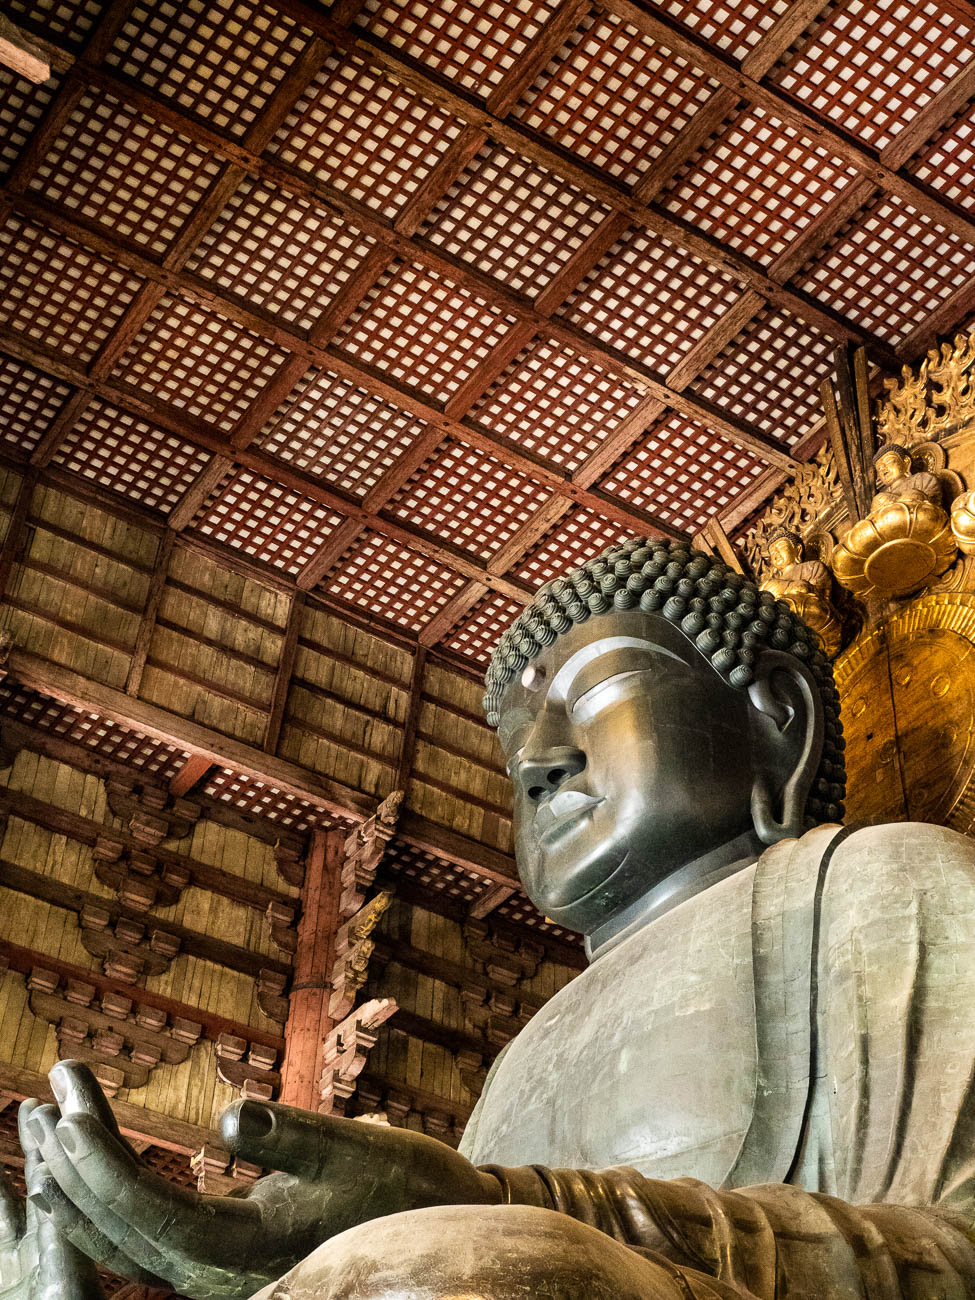 The great Buddha stature in the Todai-ji Temple at Nara, Japan